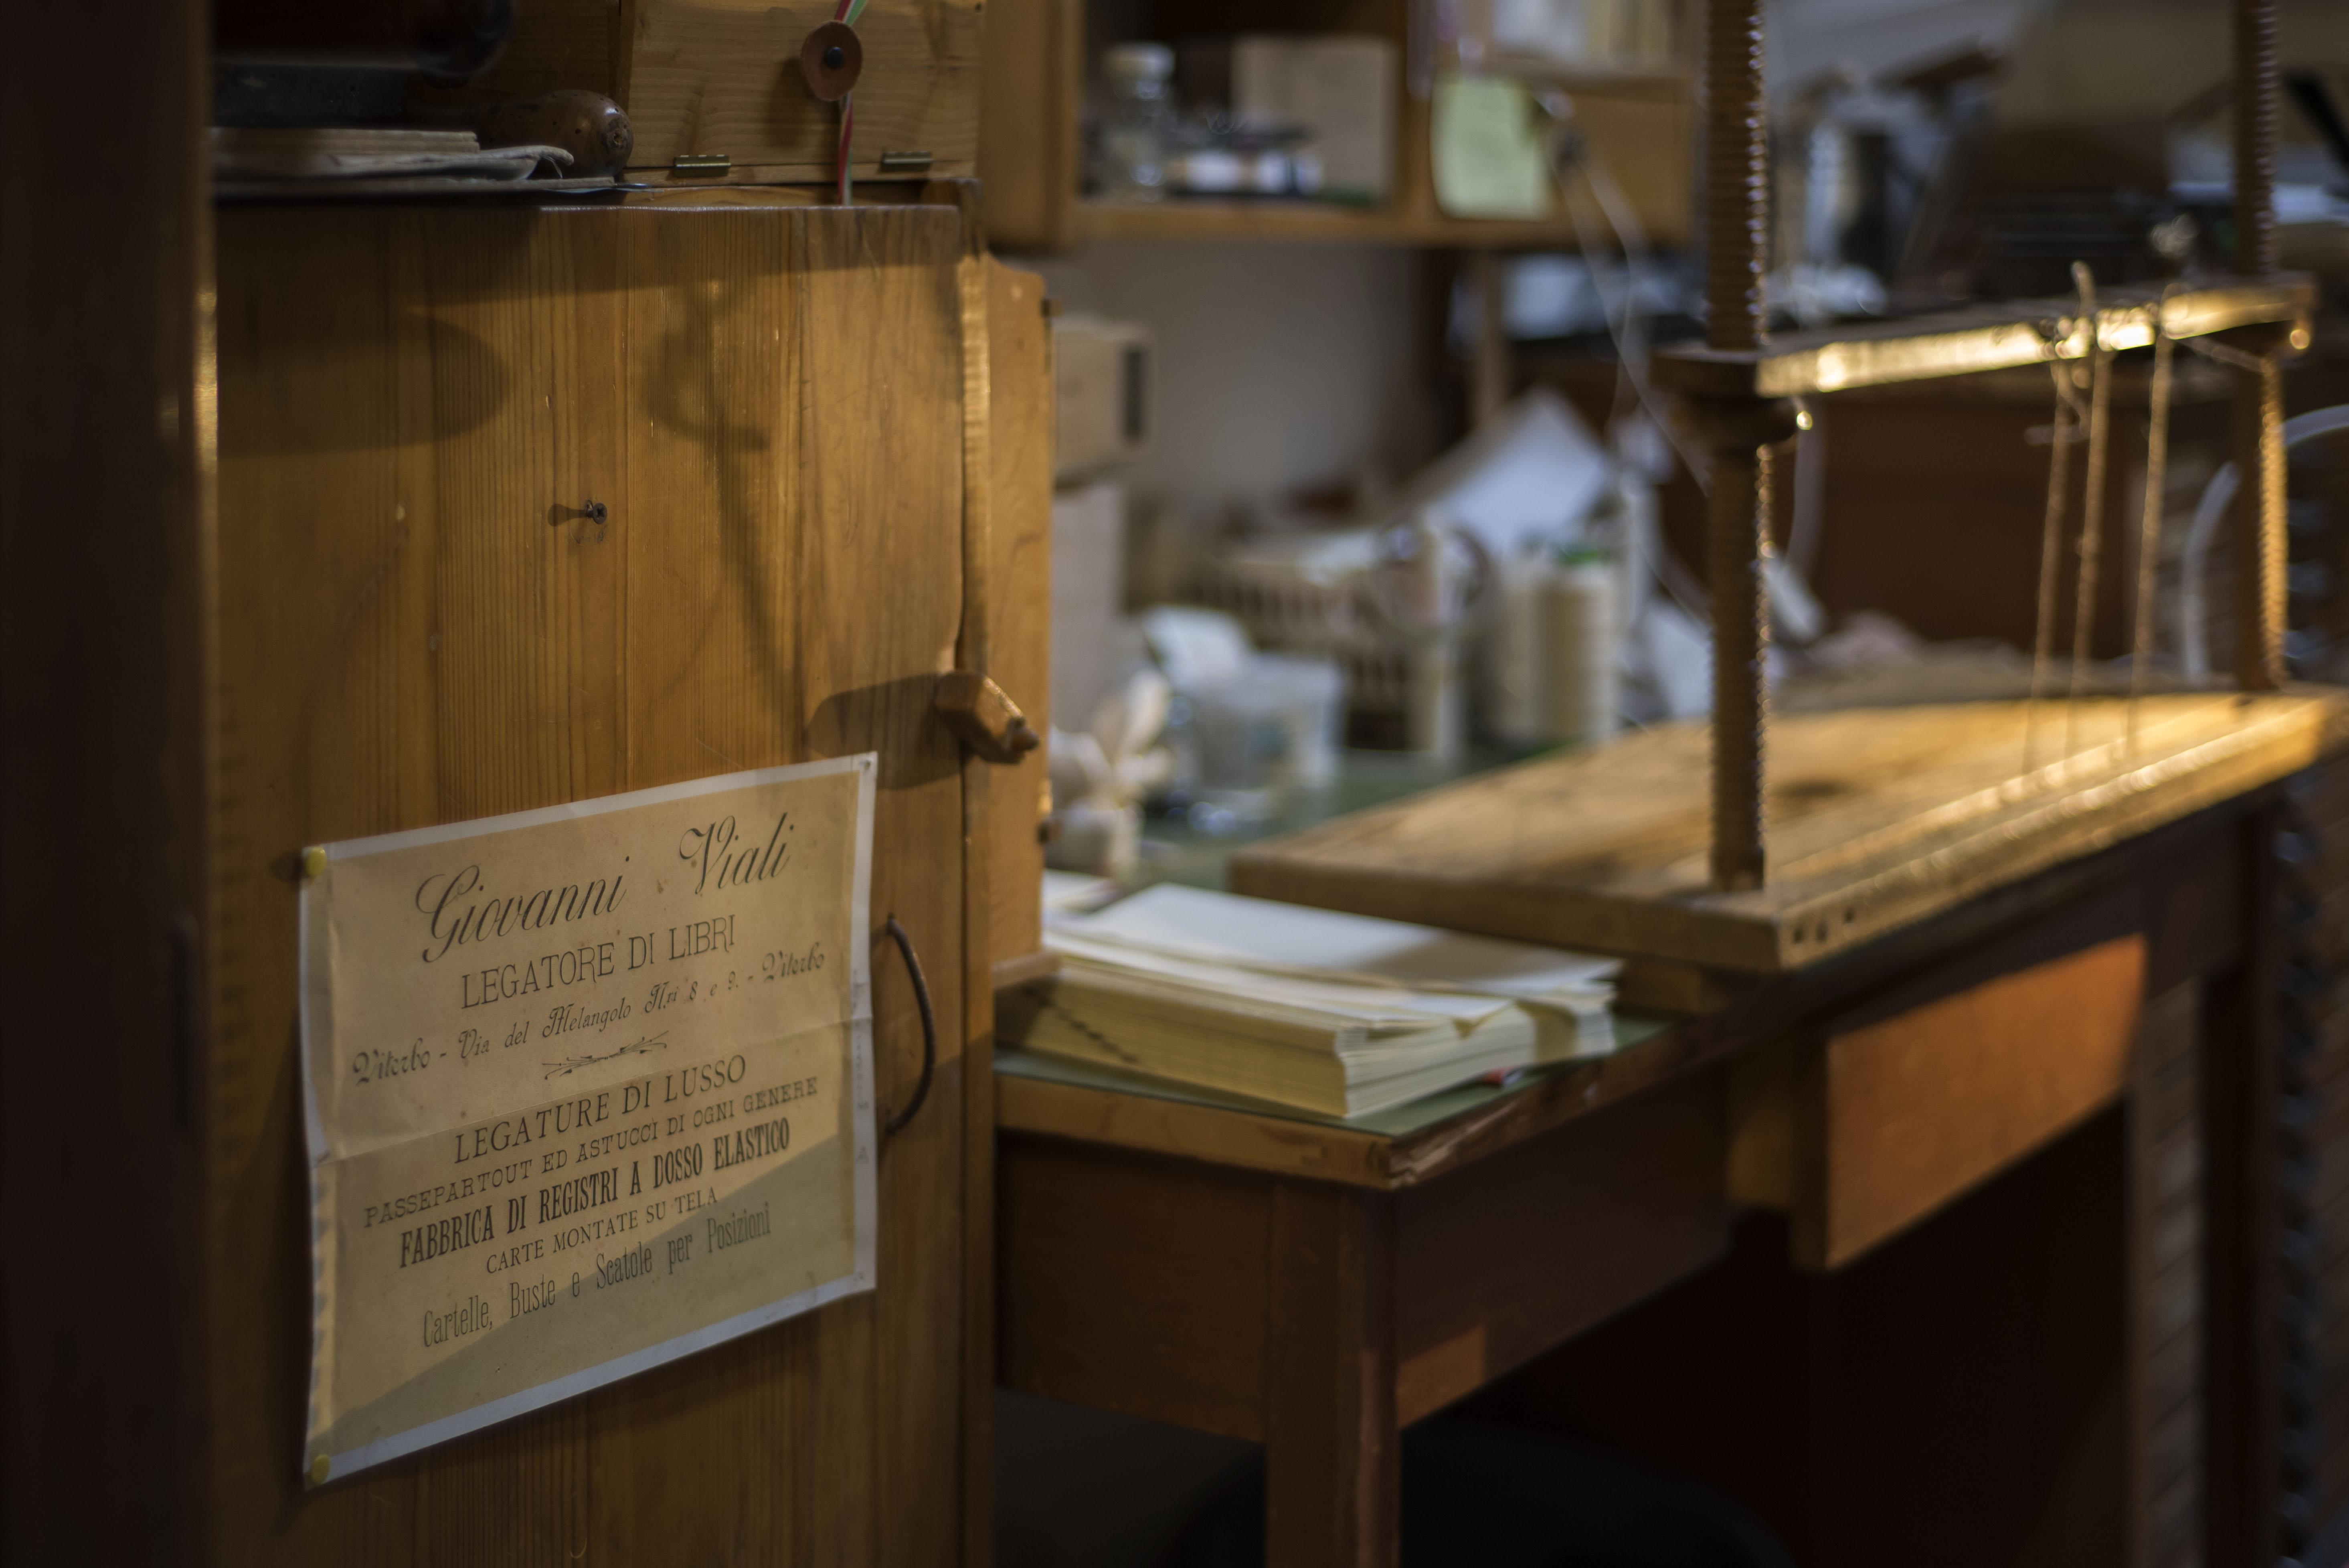 antica-legatoria-viali-bookbinders-viterbo-thumbnail